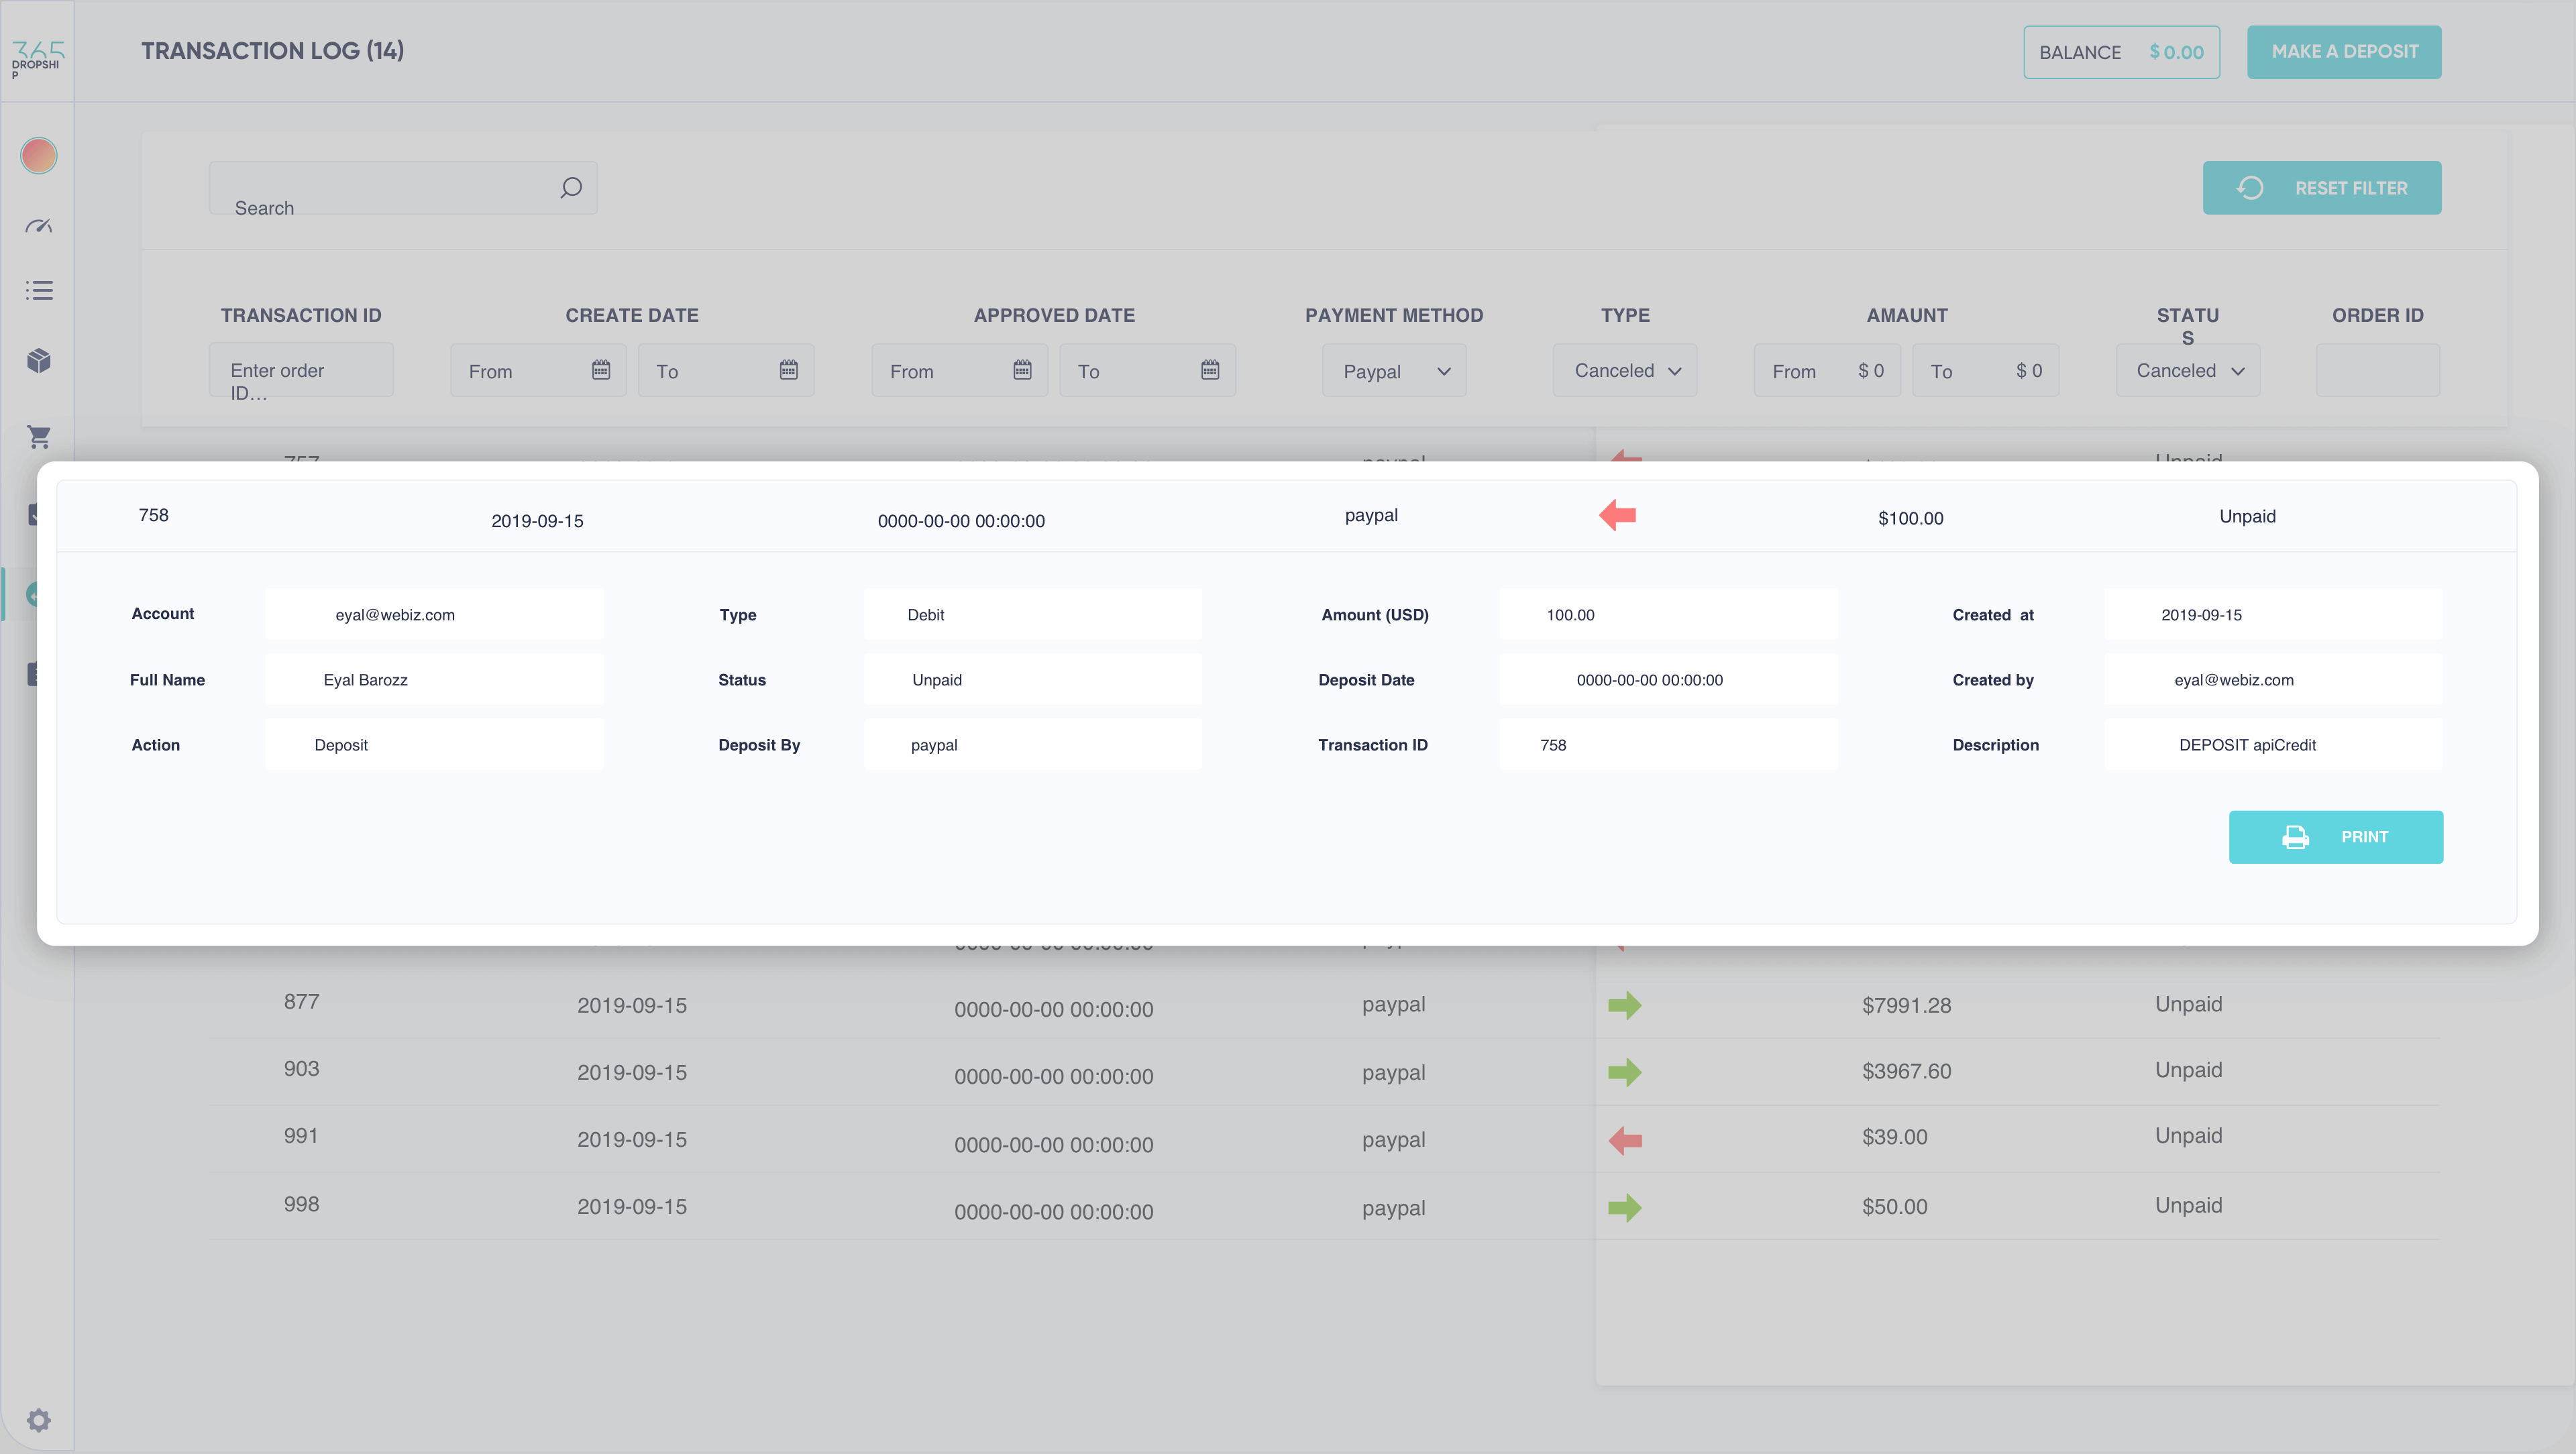 365Dropship platform transaction